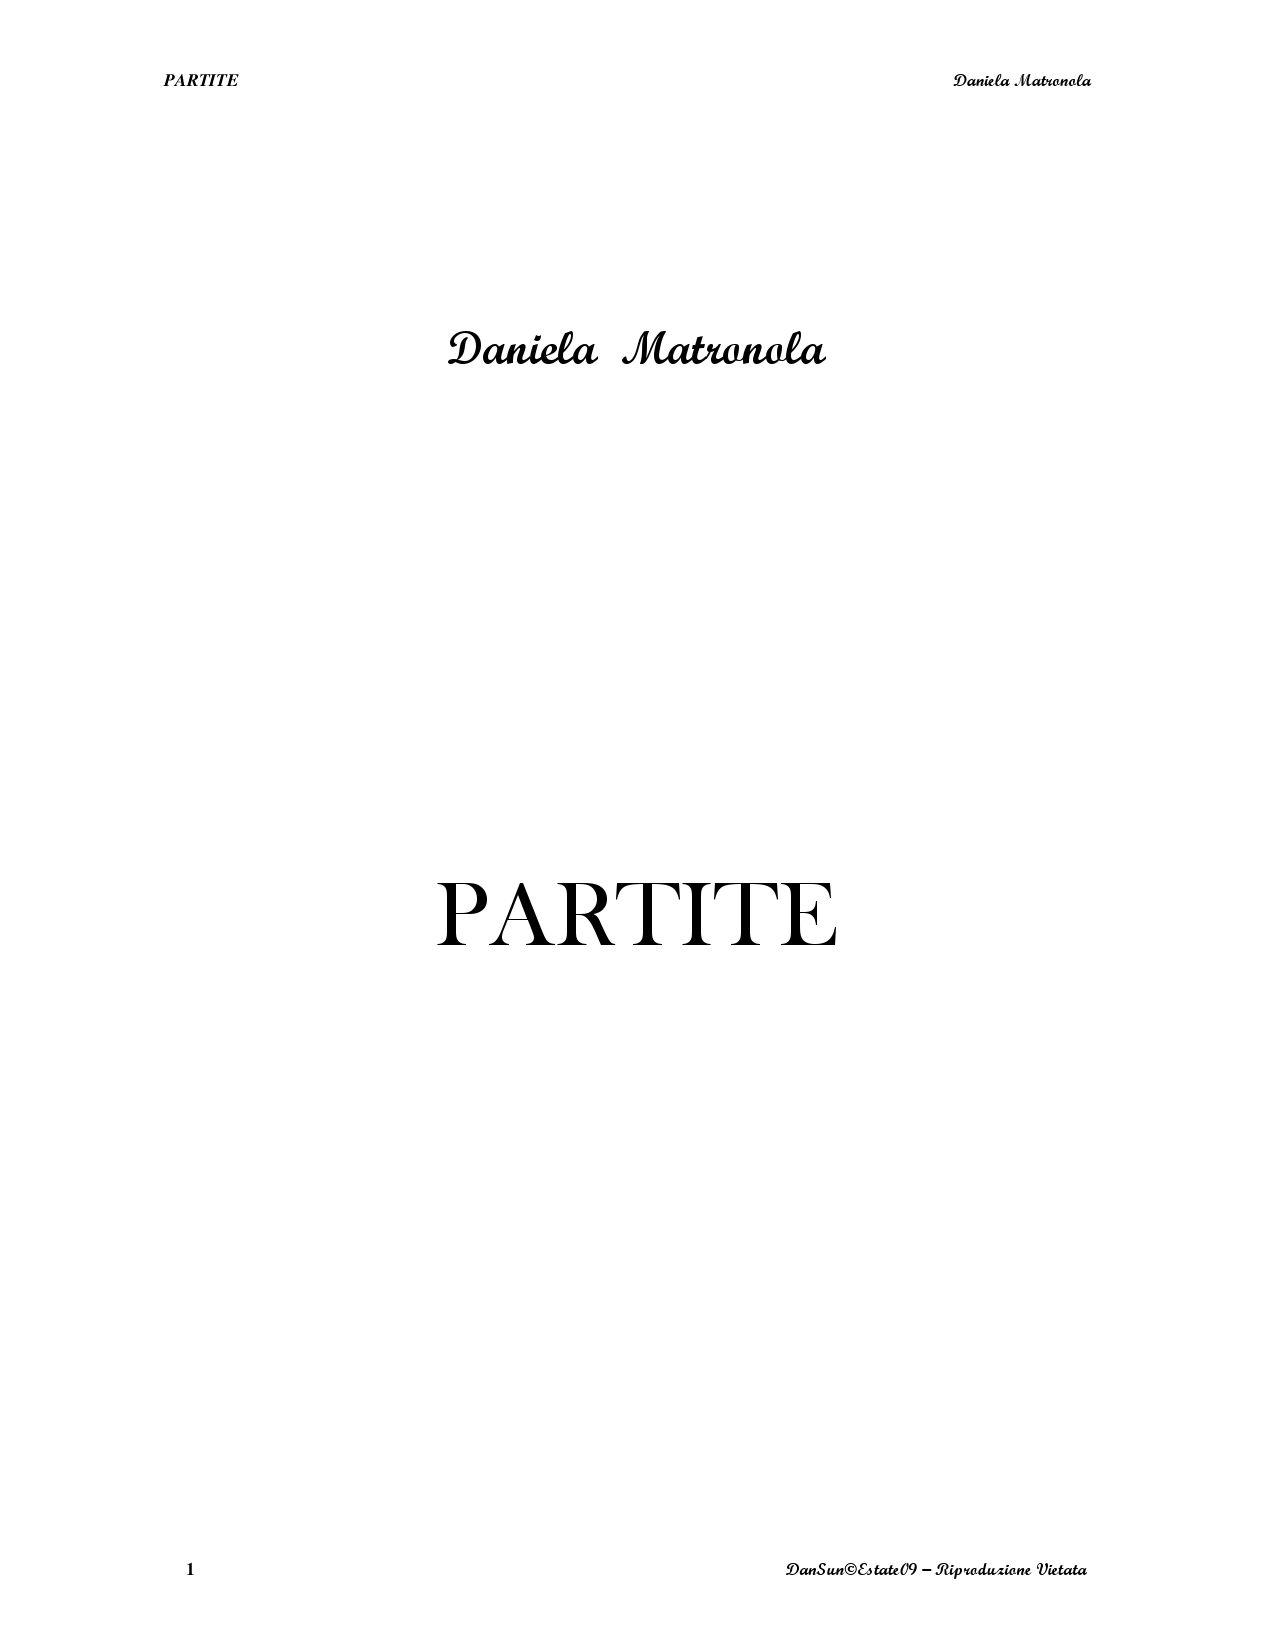 a6ac002588 PARTITE by Daniela Matronola - issuu